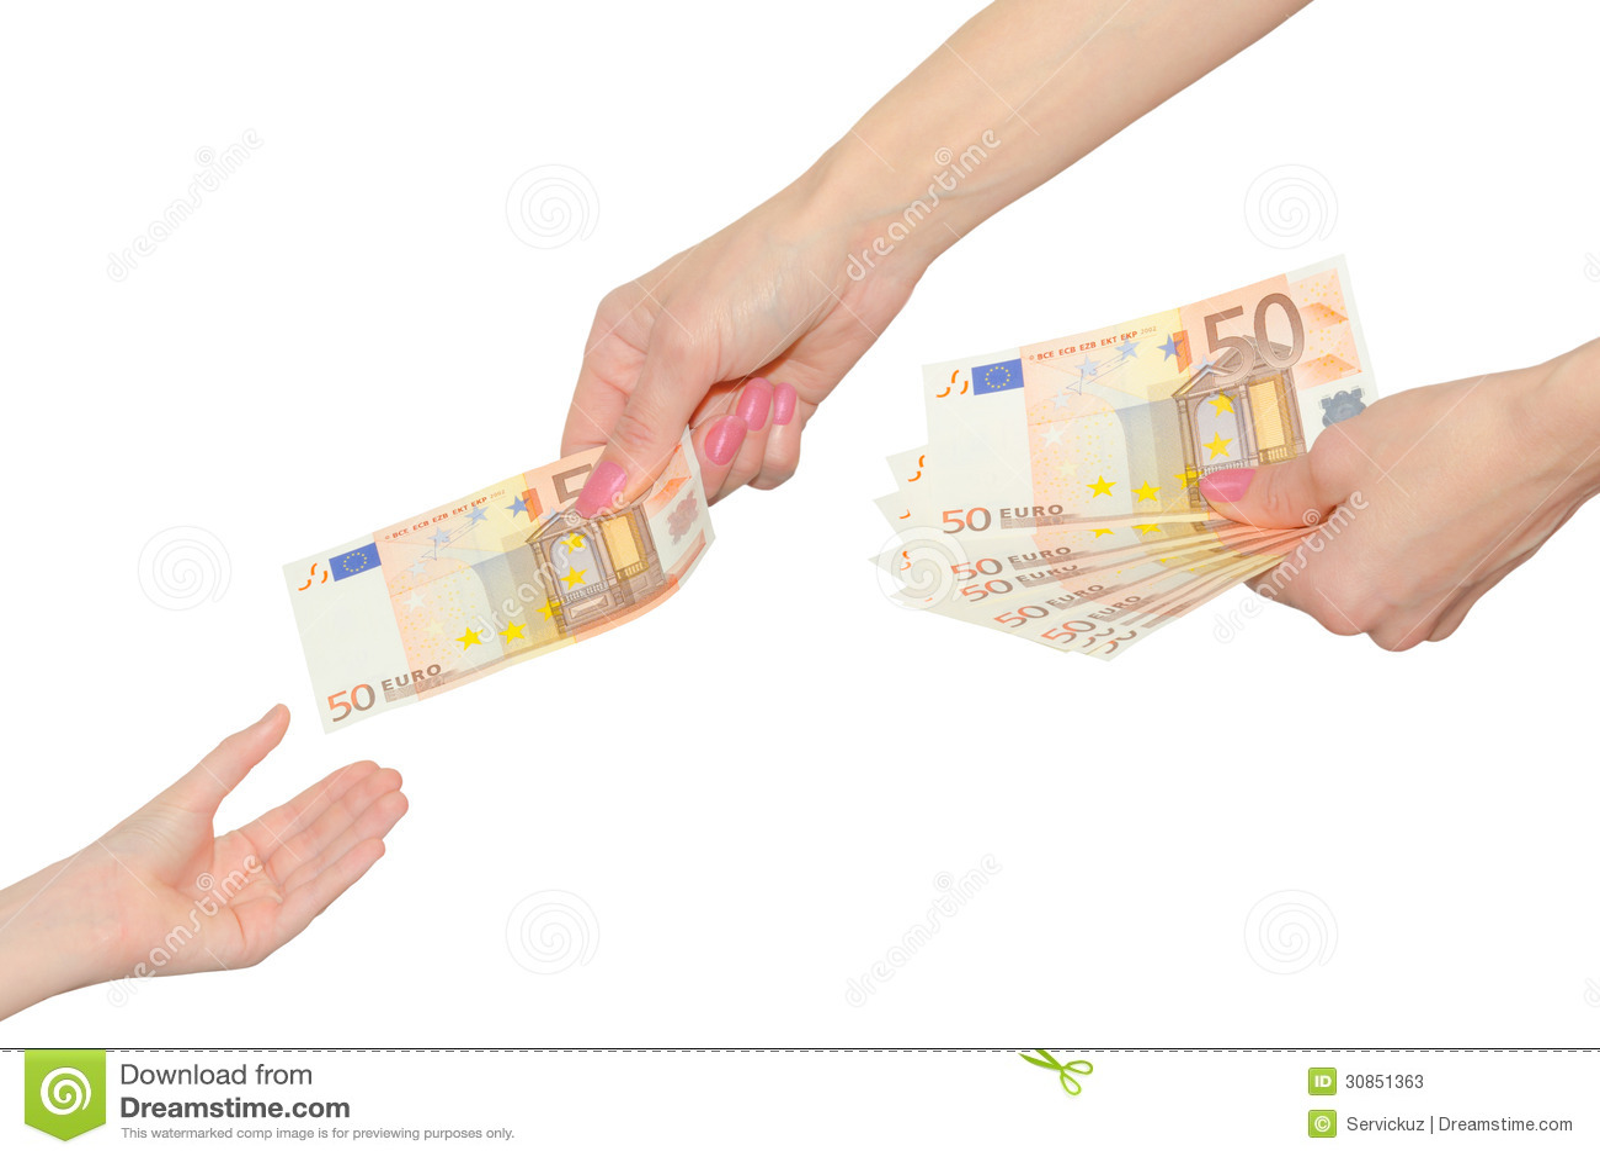 Pocket money spoils children